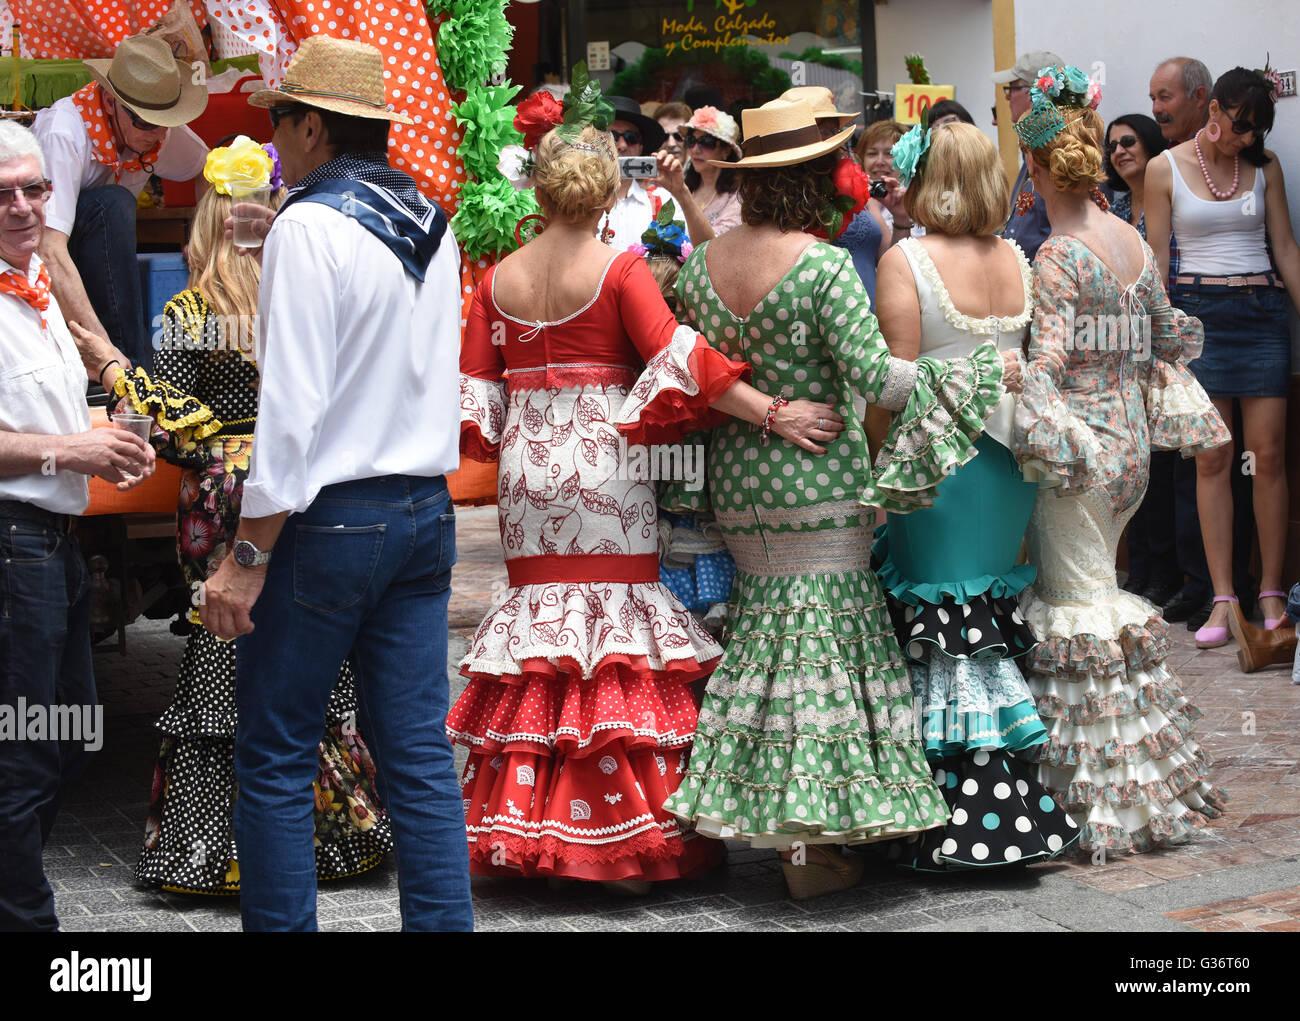 Le donne in costume tradizionale a San Isidro festival fiesta in Nerja Andalusia Spagna Immagini Stock